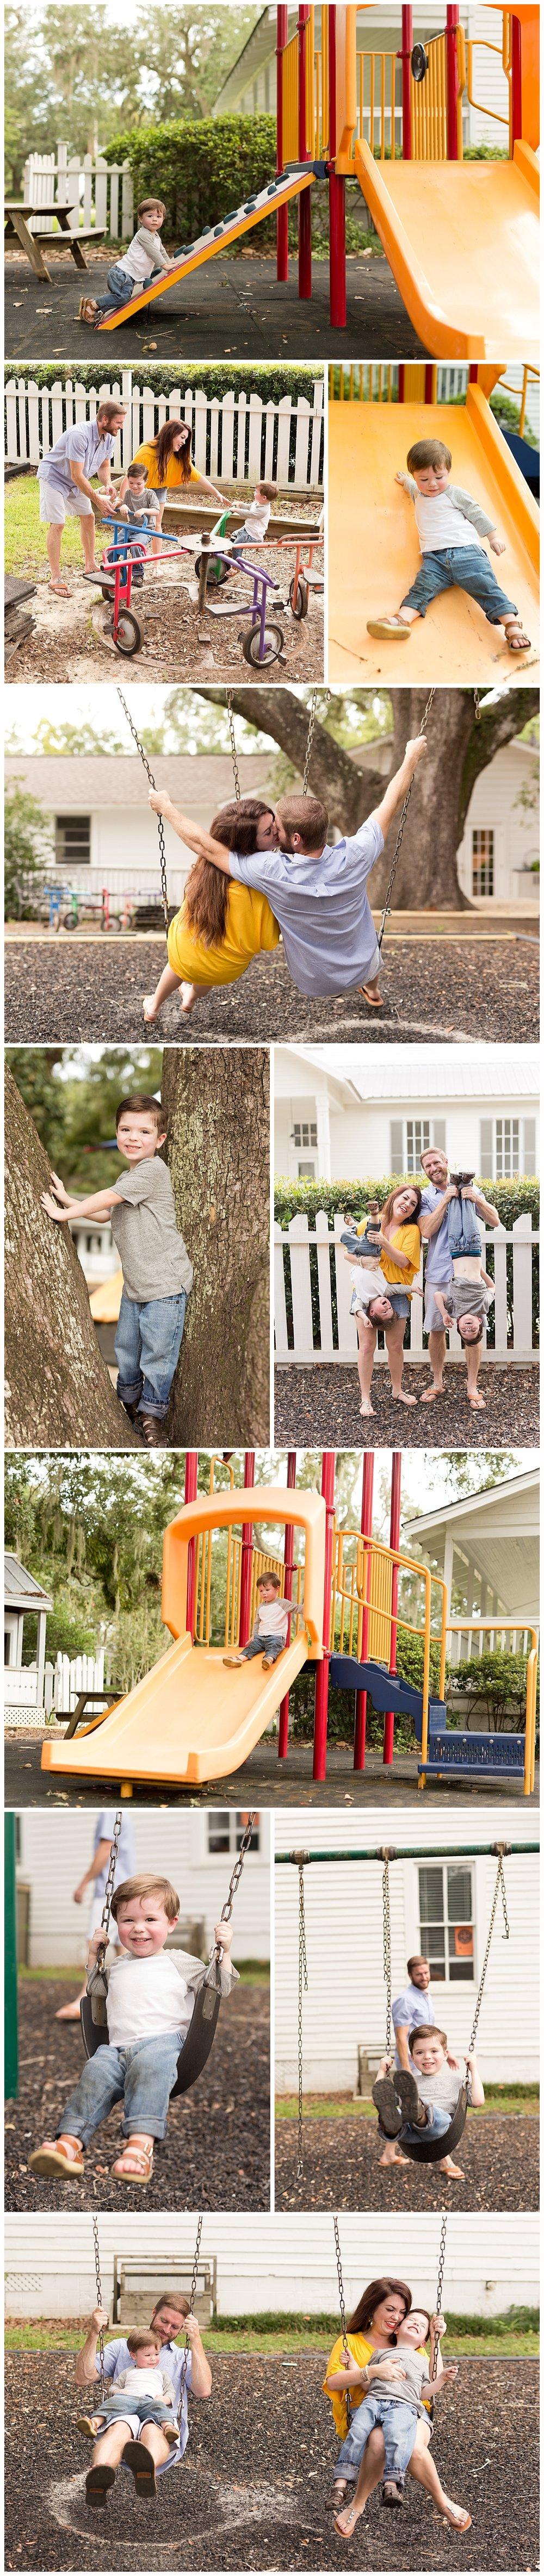 fun family pictures on playground - Ocean Springs family photos